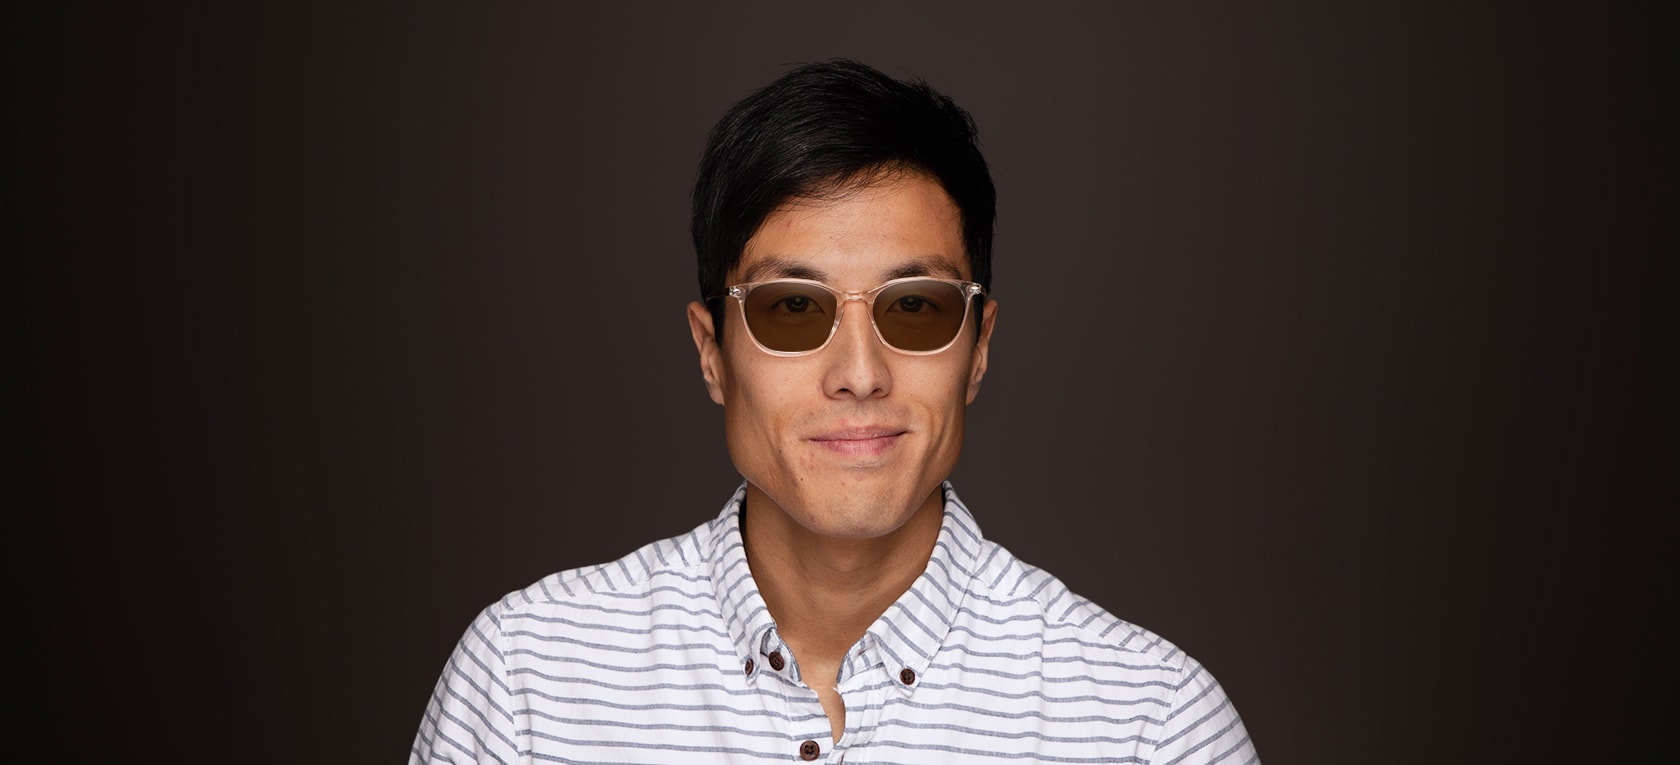 Image of model wearing Chelan frames